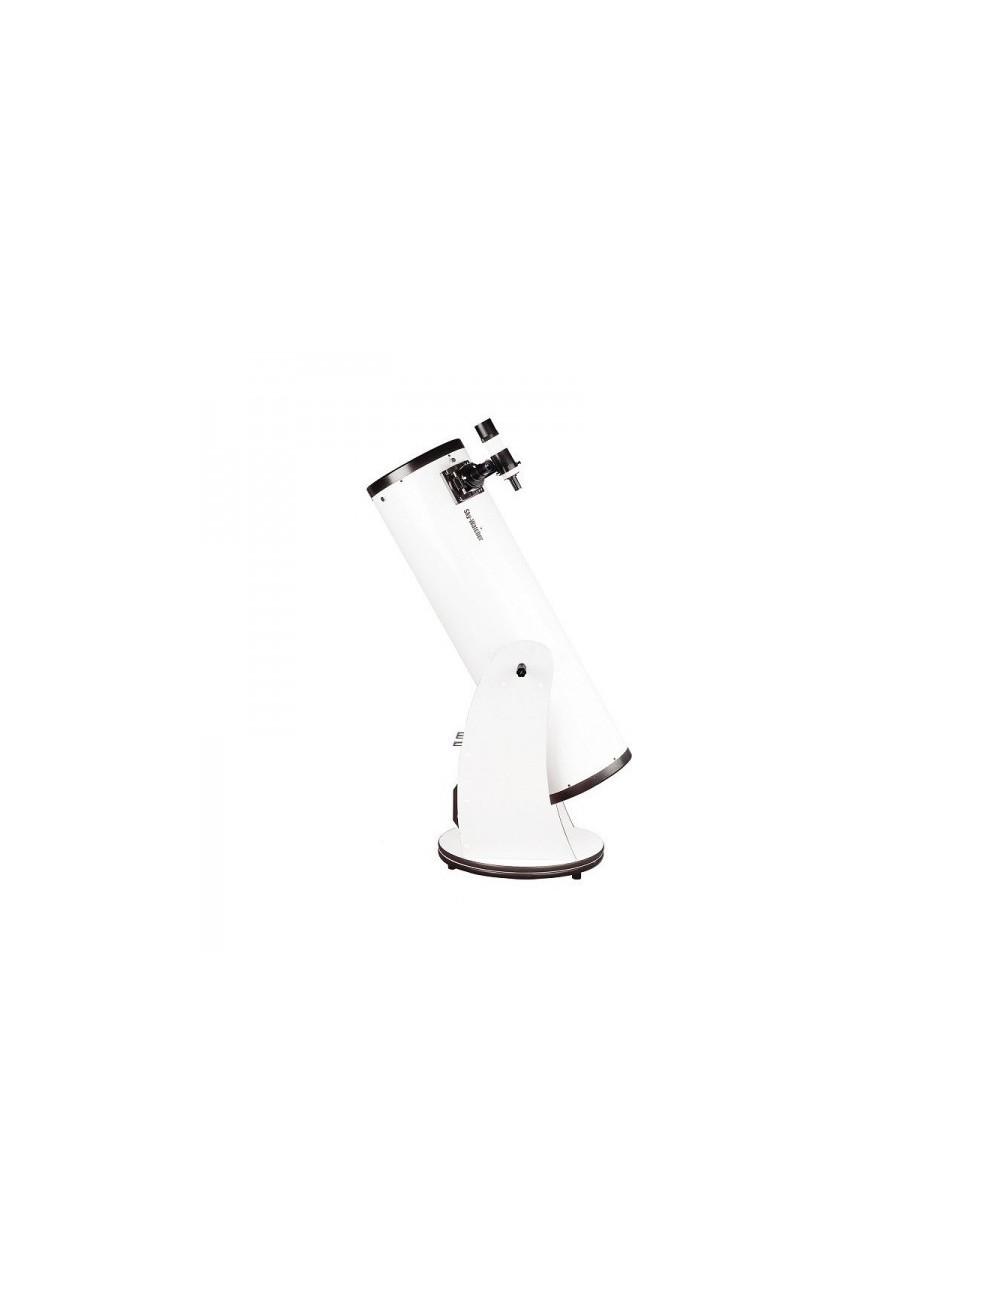 Télescope Dobson SkyWatcher 300/1500 Skyliner